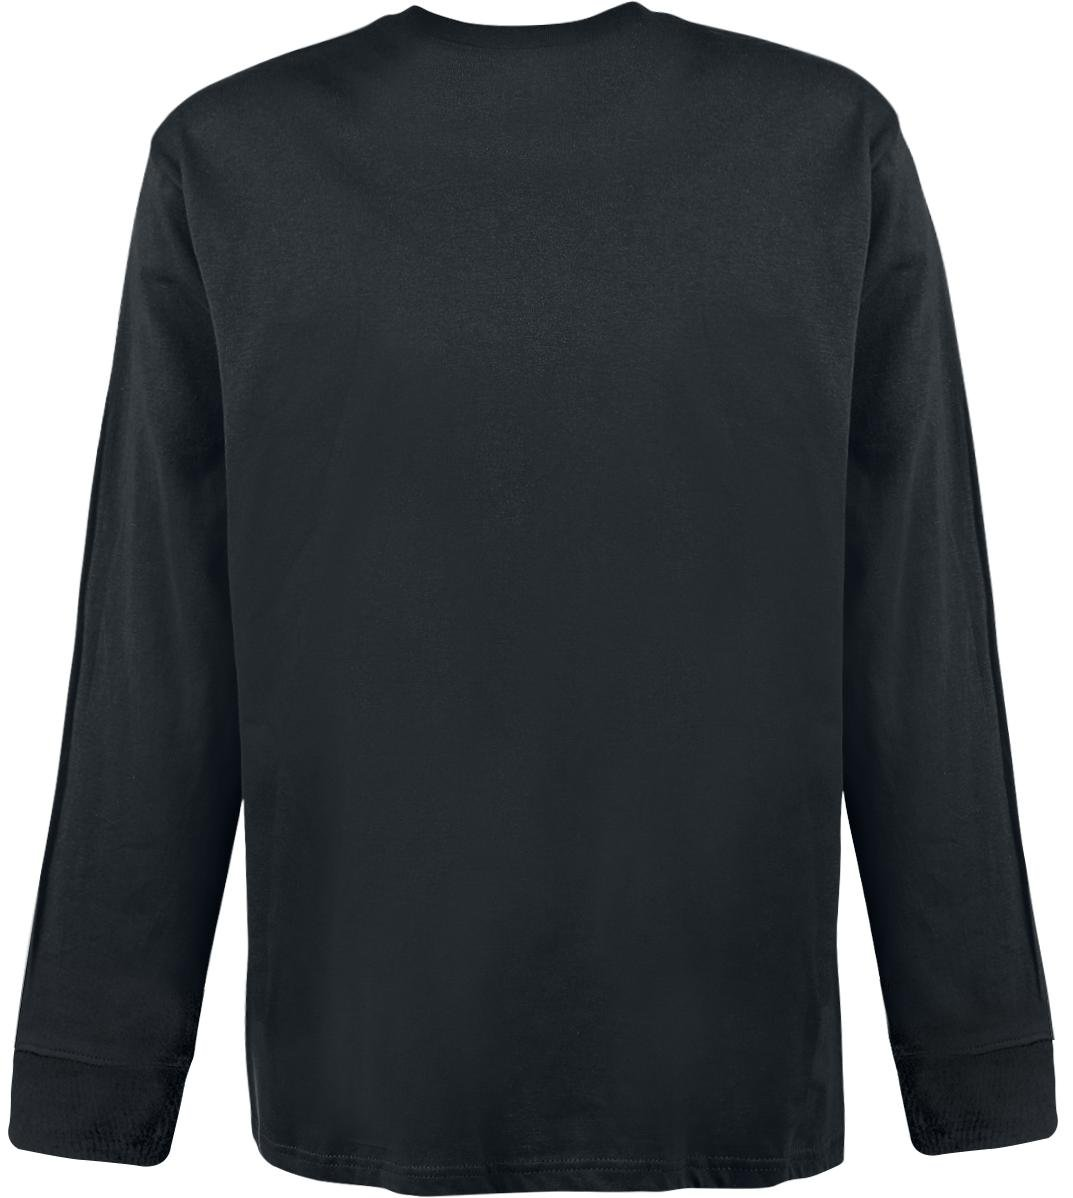 Pauli Sweatshirt Totenkopf XL St